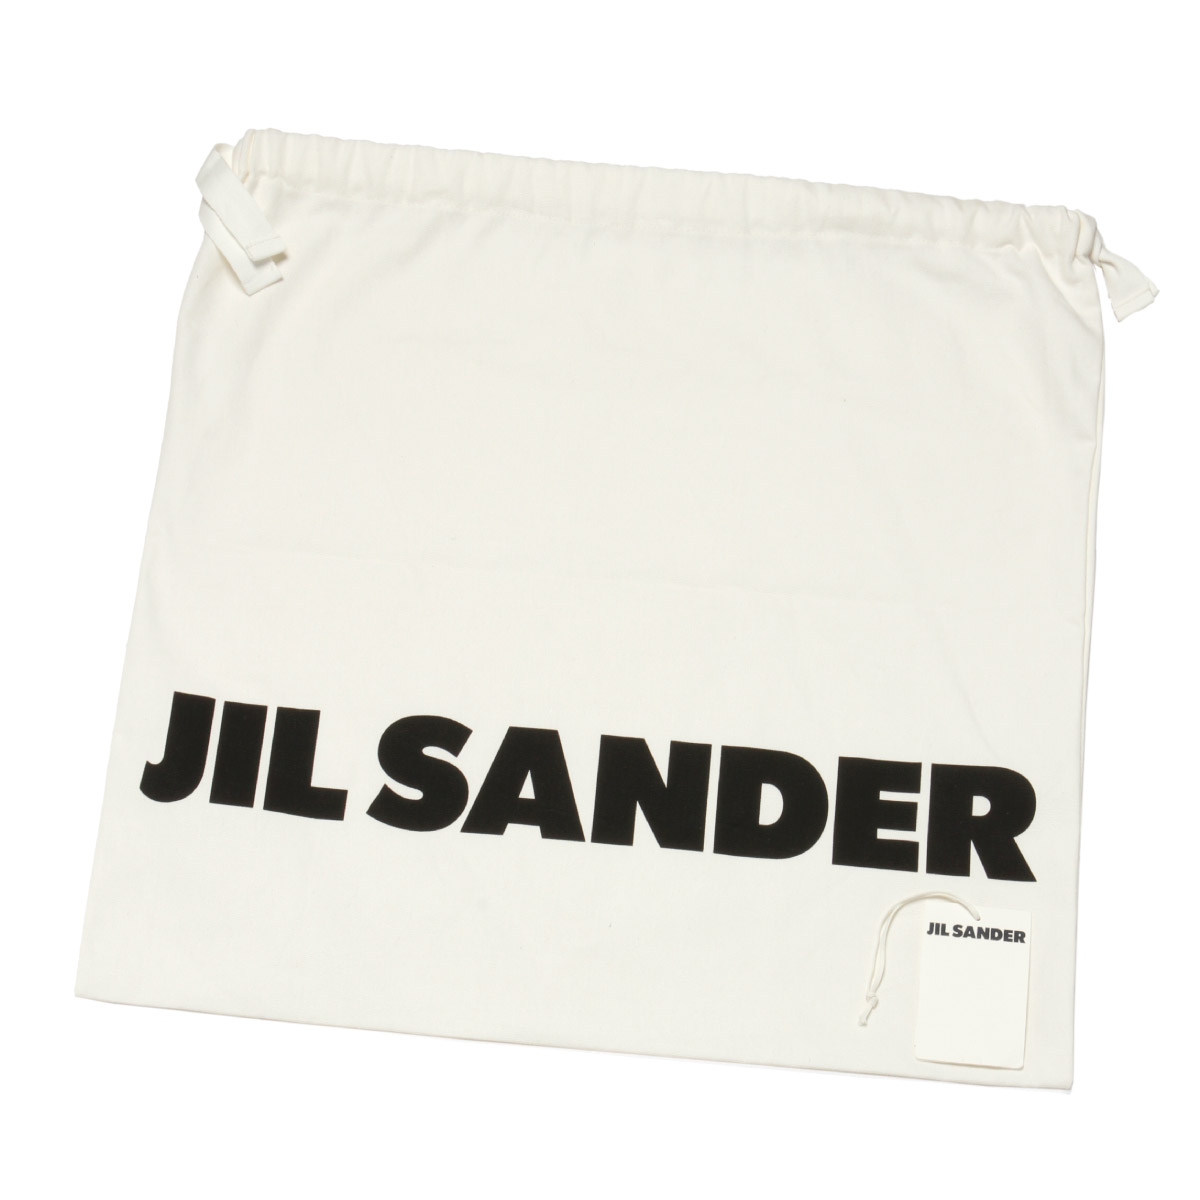 JIL SANDER ジル サンダー | トートバッグ